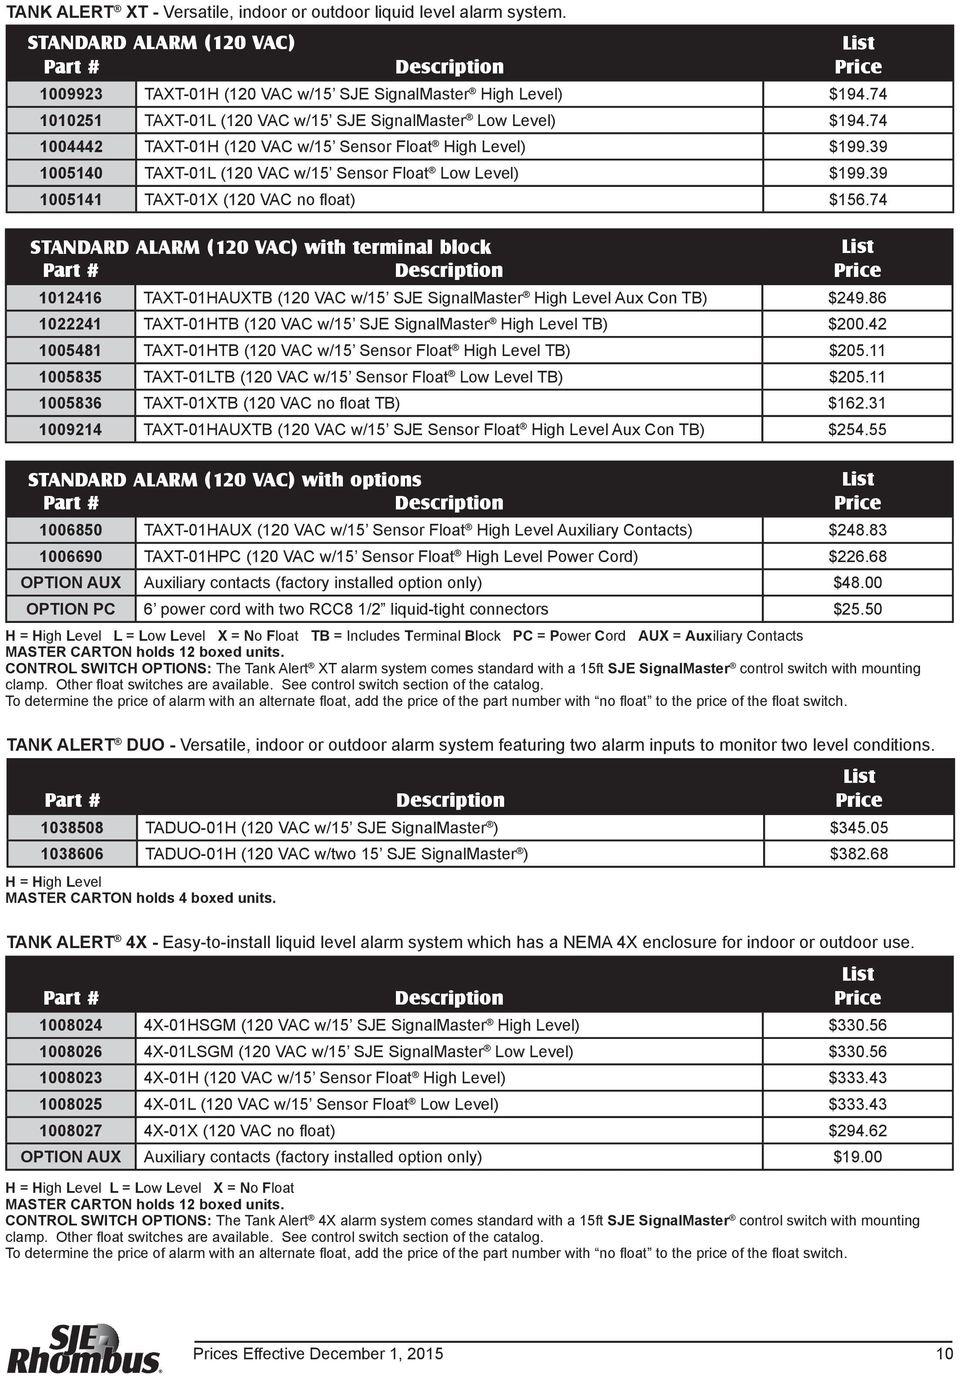 medium resolution of 39 1005141 taxt 01x 120 vac no float 156 74 standard alarm 120